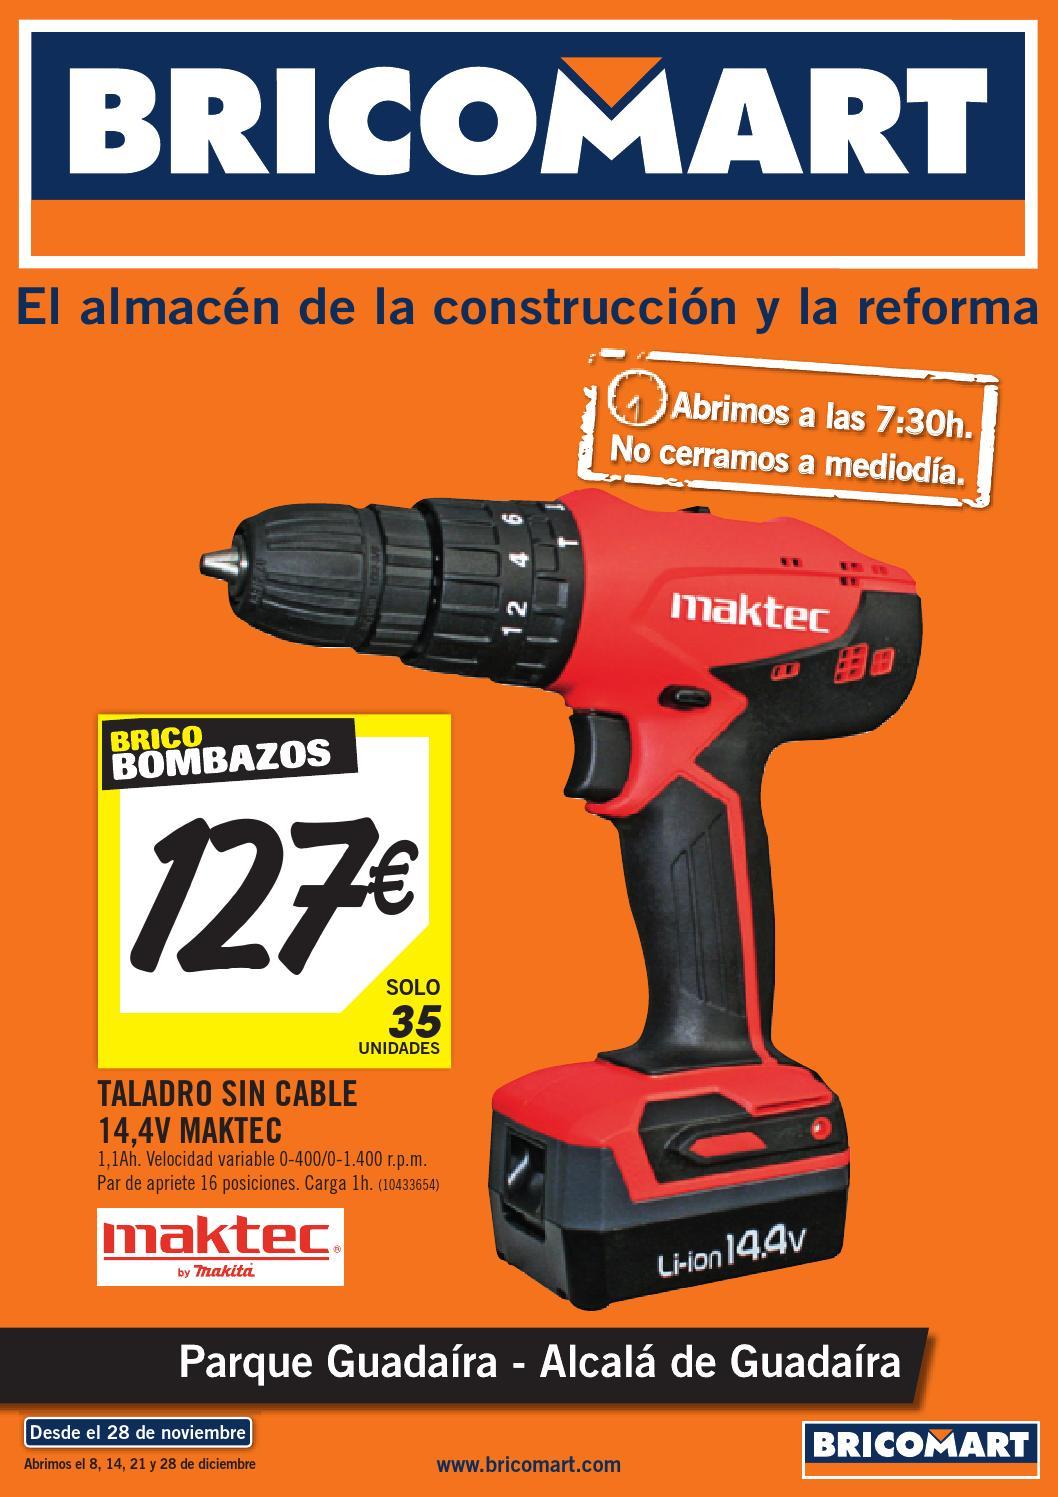 Bricomart folleto sevilla alcala guadaira 24 11 2014 by - Puertas plegables bricomart ...